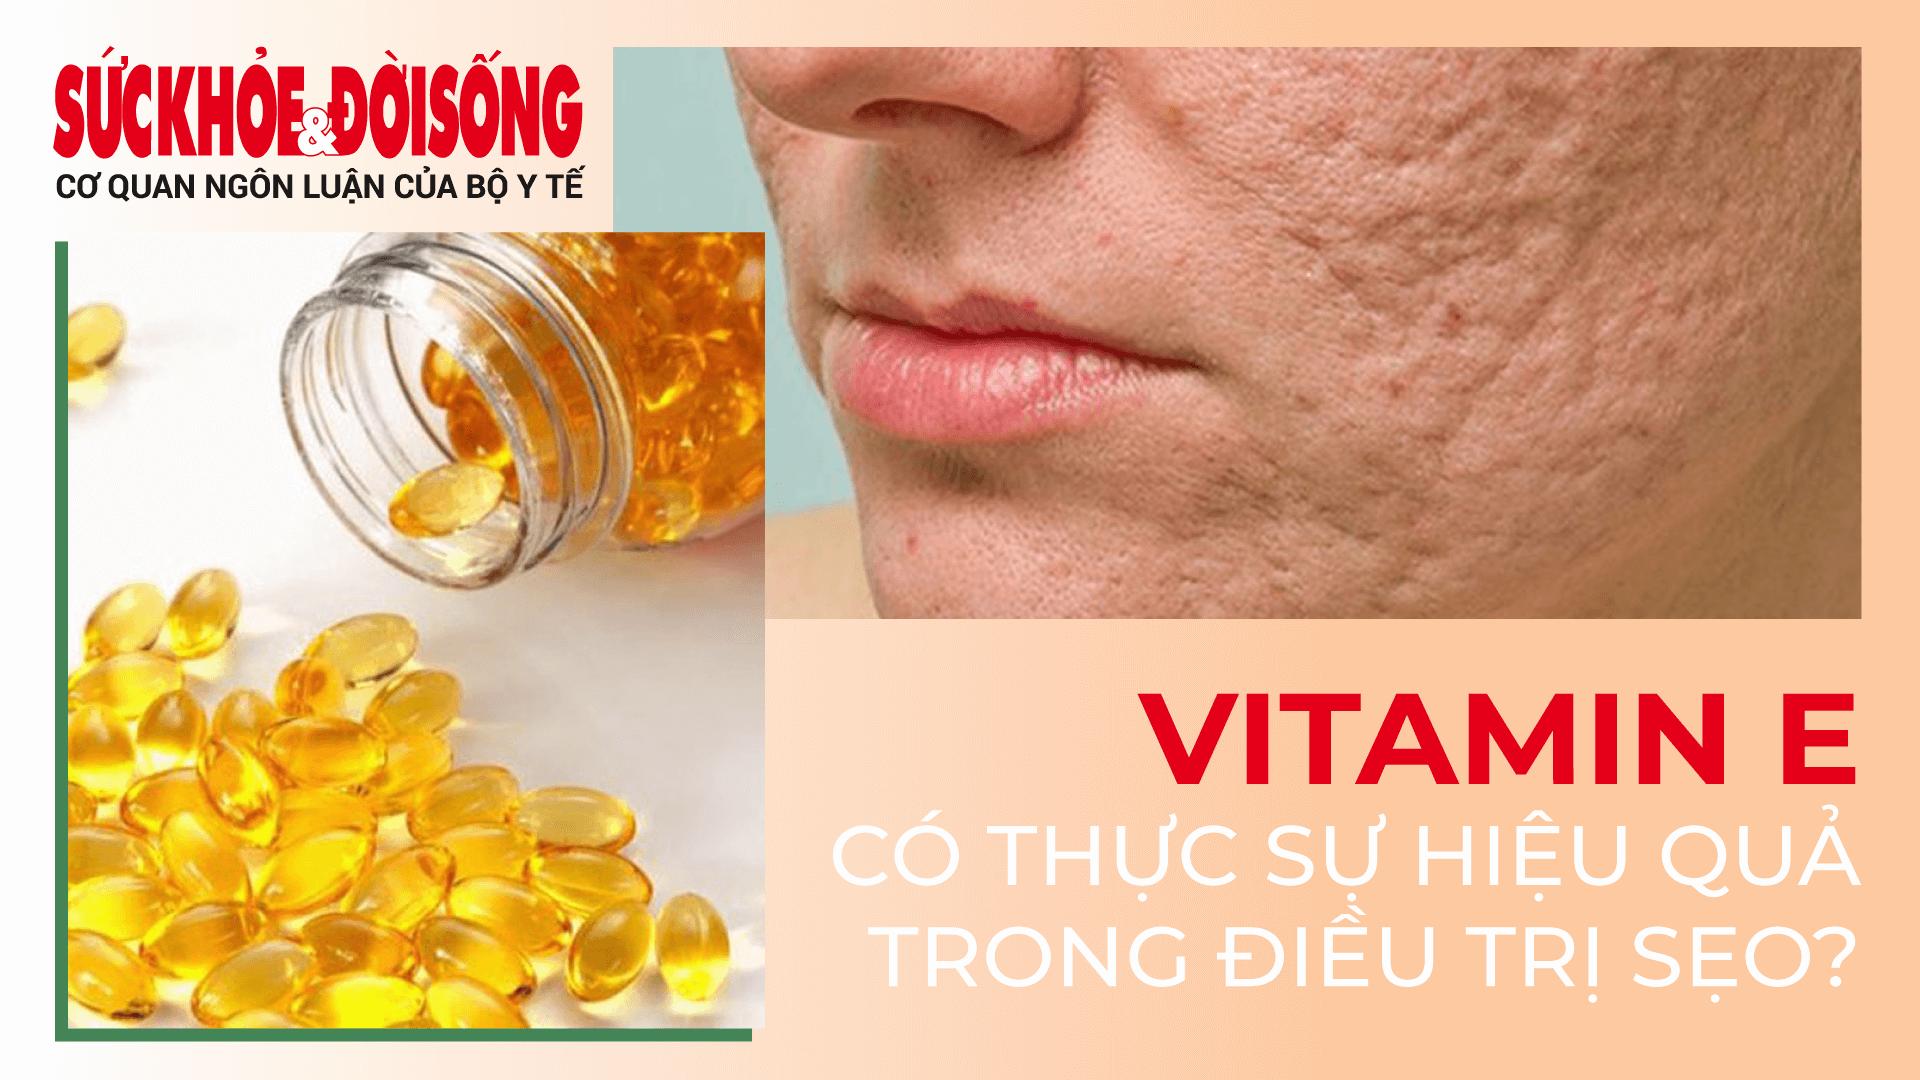 Hiệu quả thực sự Vitamin E điều trị sẹo